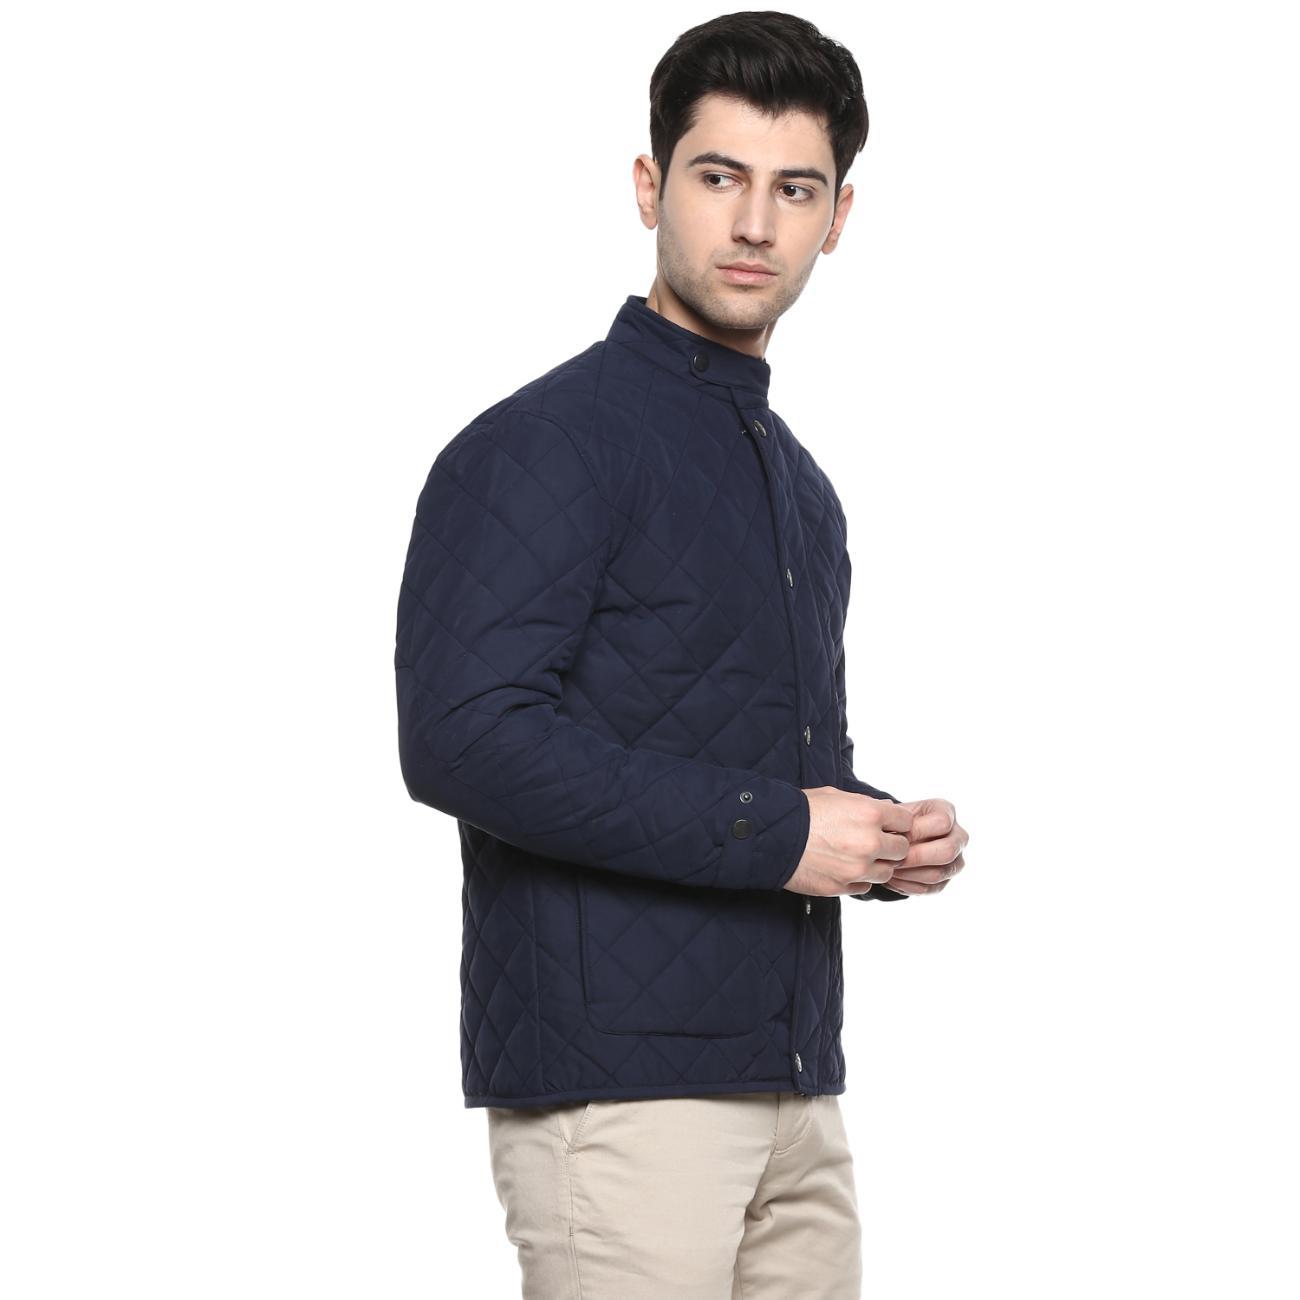 D. Navy Jacket for Men Online